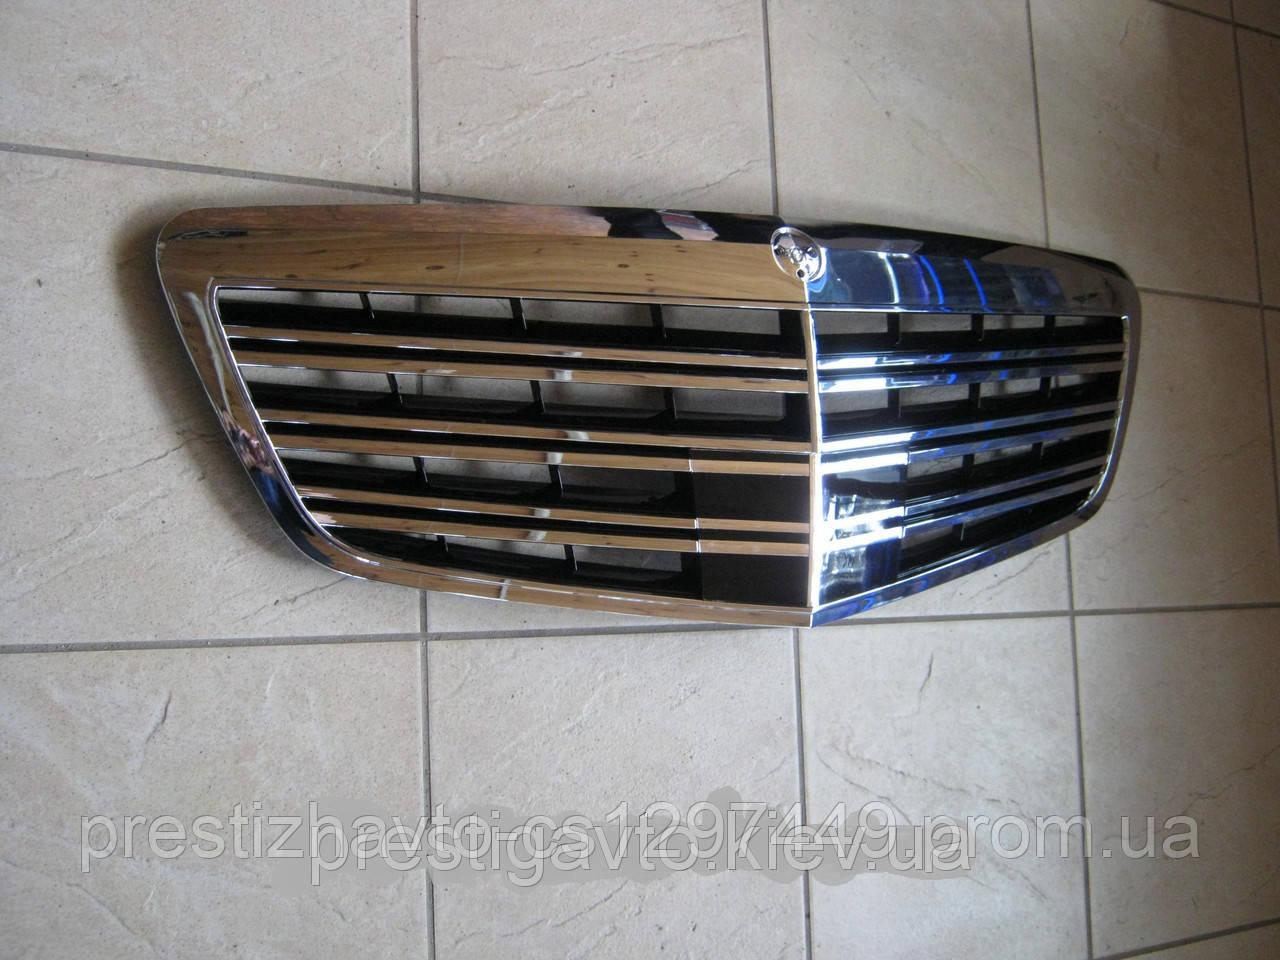 Решетка радиатора AMG на Mercedes S-Сlass W221 рестайлинг